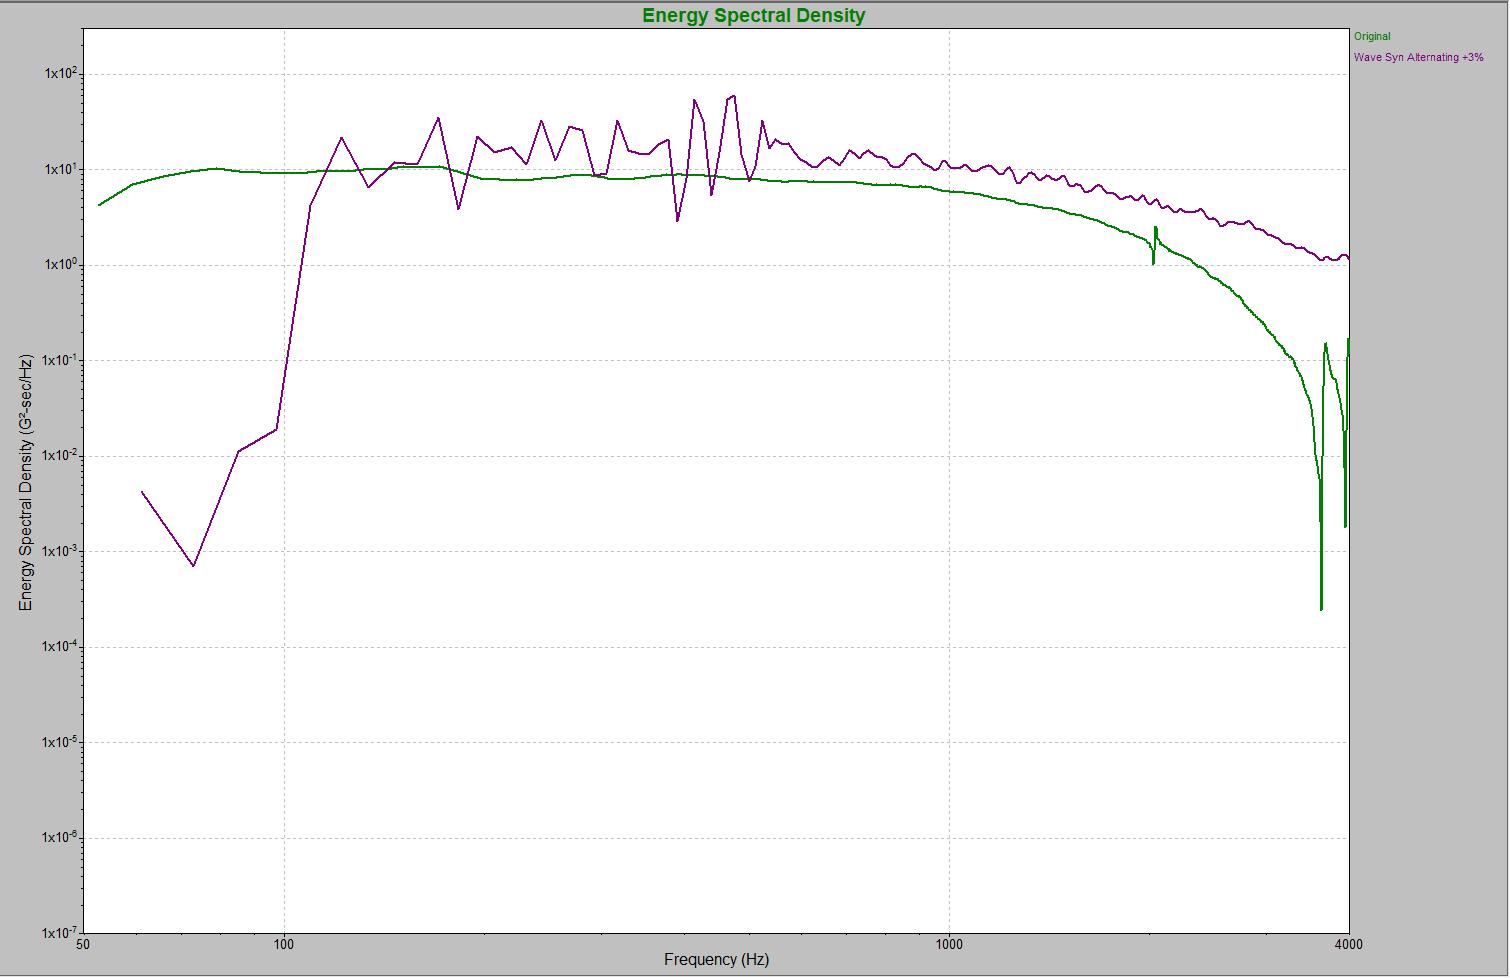 A WavSyn Alternating waveform overlaid on the original recording